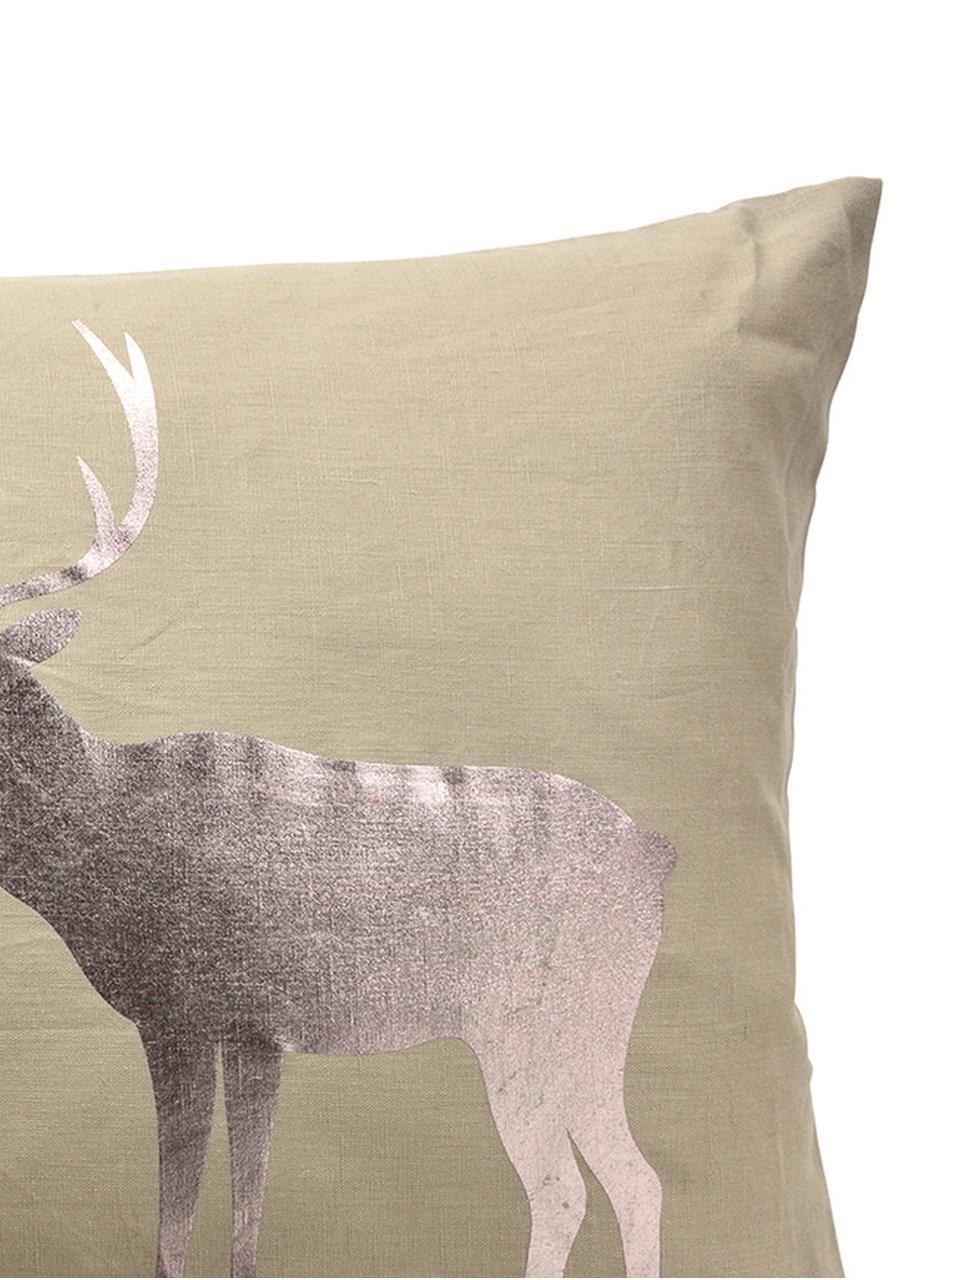 Federa Forrest con motivo cervo lucido, 55% lino, 45% cotone, Beige, bronzo, Larg. 35 x Lung. 60 cm